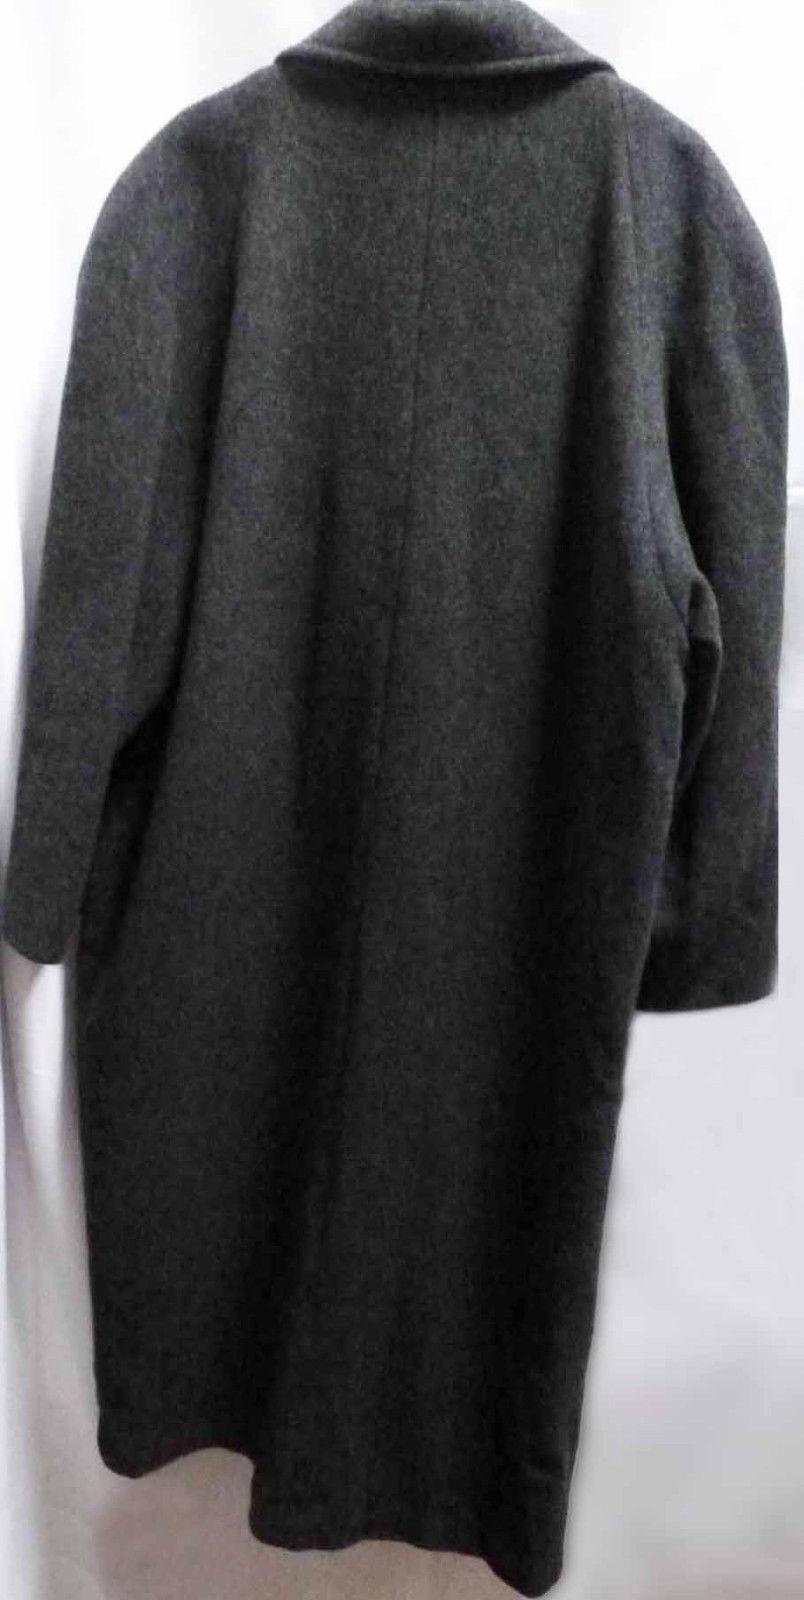 Vintage Gray Wool Top Coat Warm Heavyweight Overc… - image 3